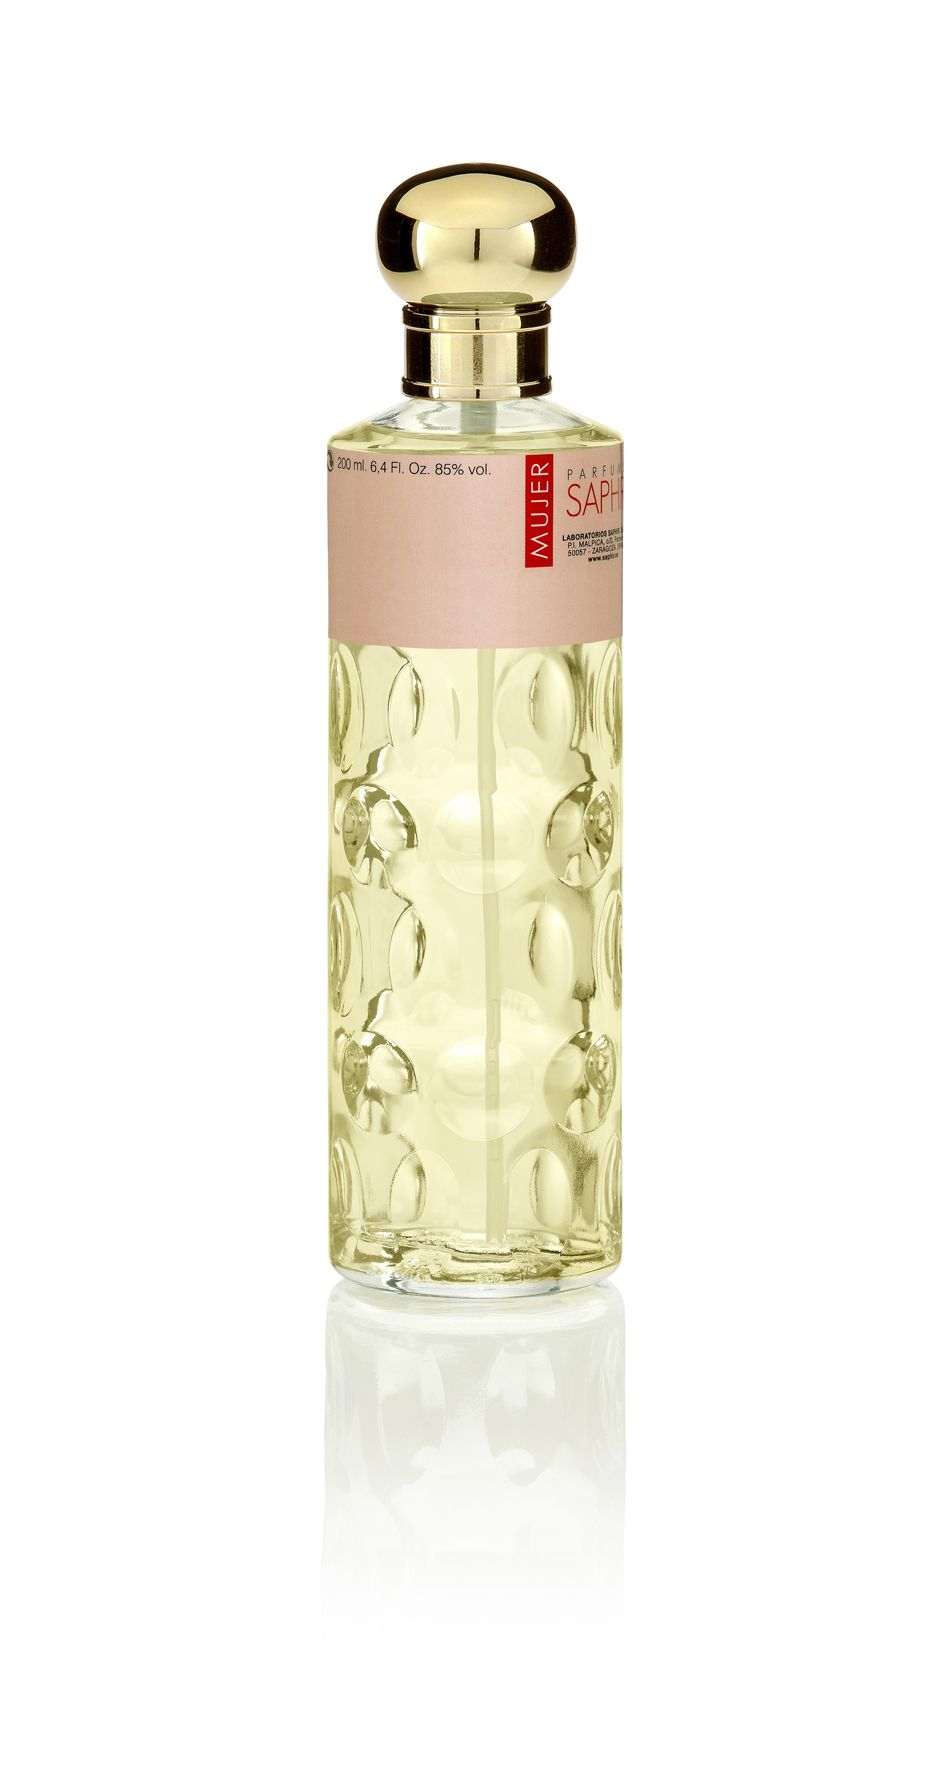 Vida De Saphir 200ml Perfume Perfume De Mujer Fragancia